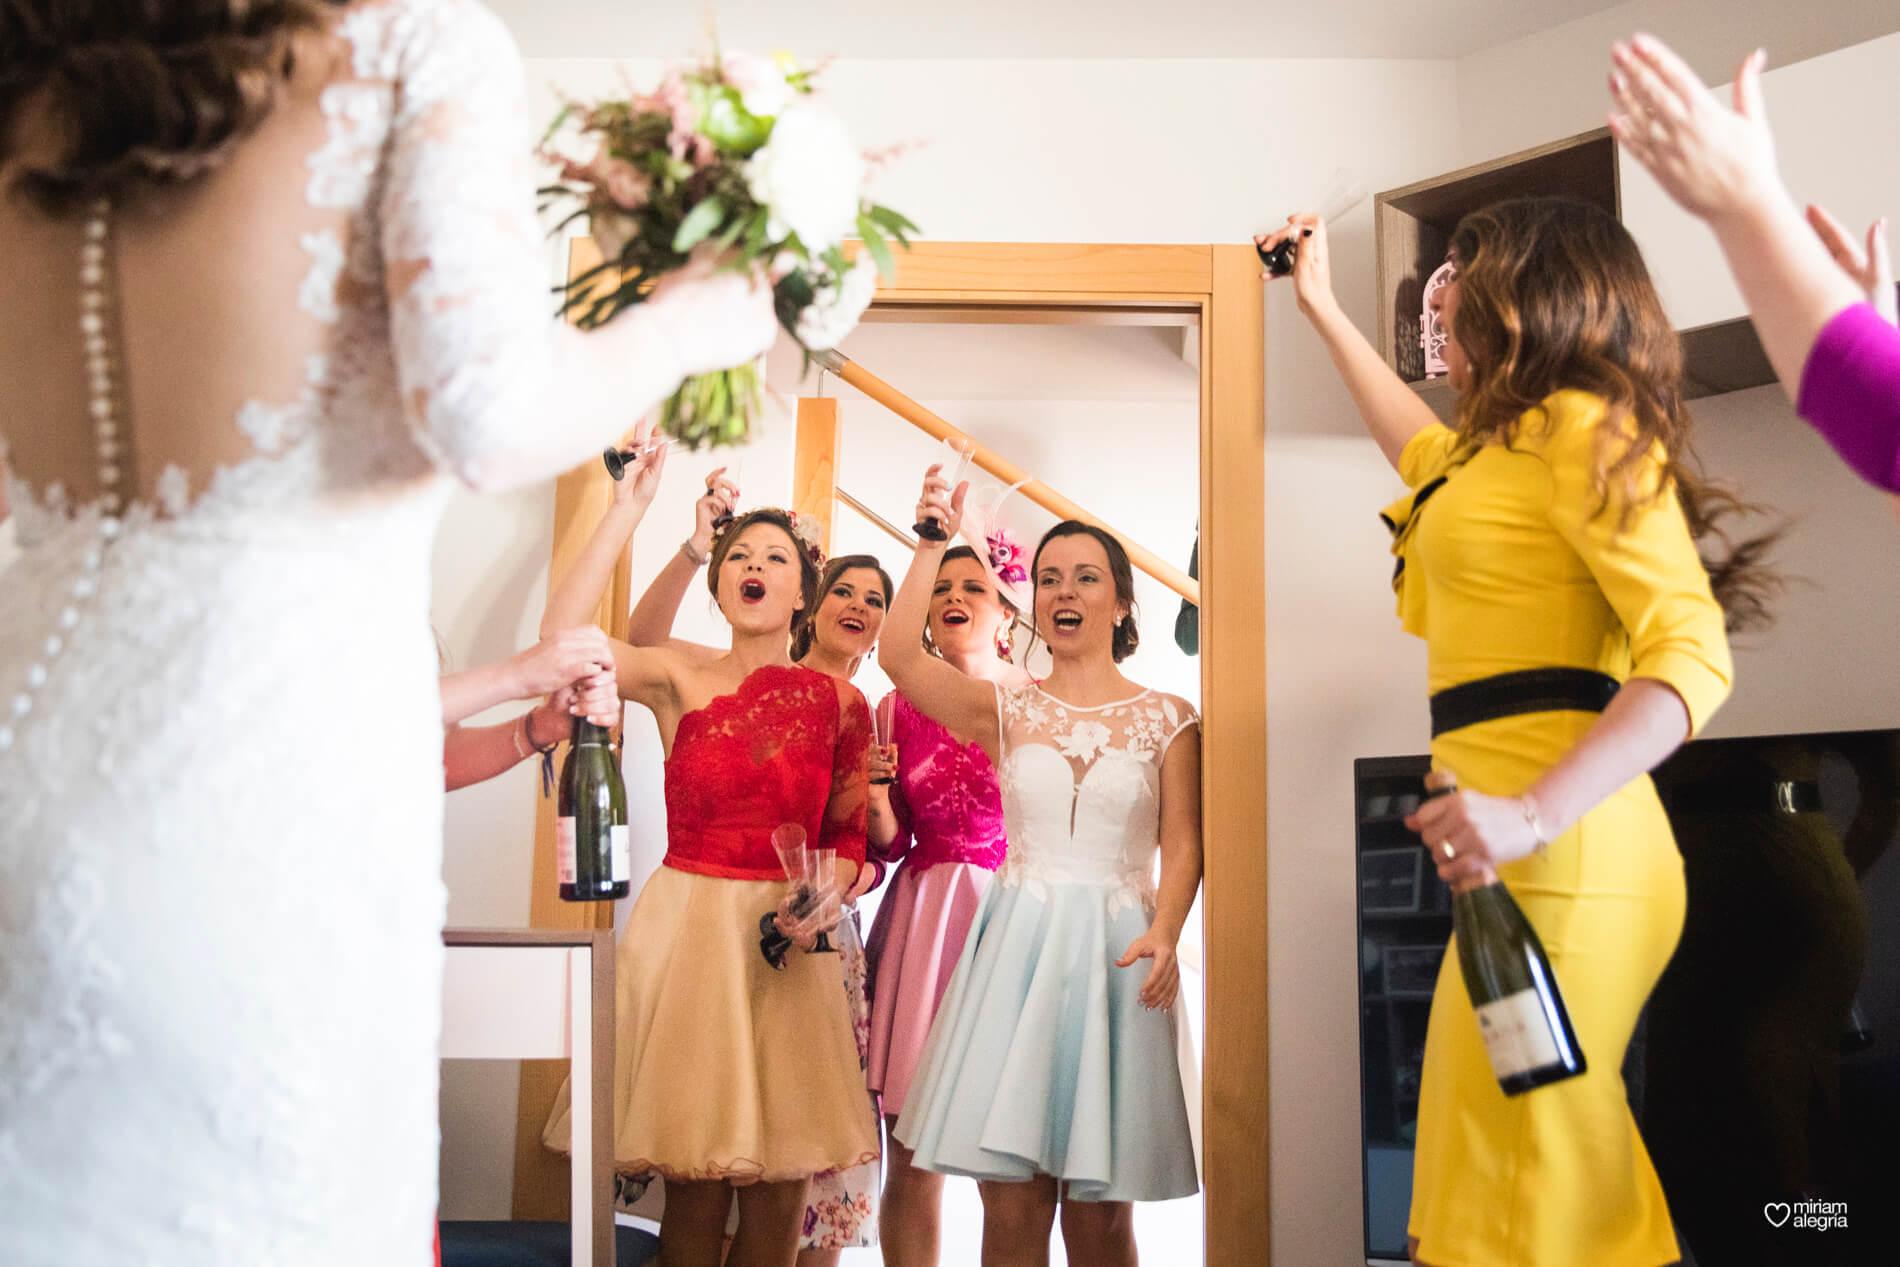 boda-en-finca-jurosa-miriam-alegria-36